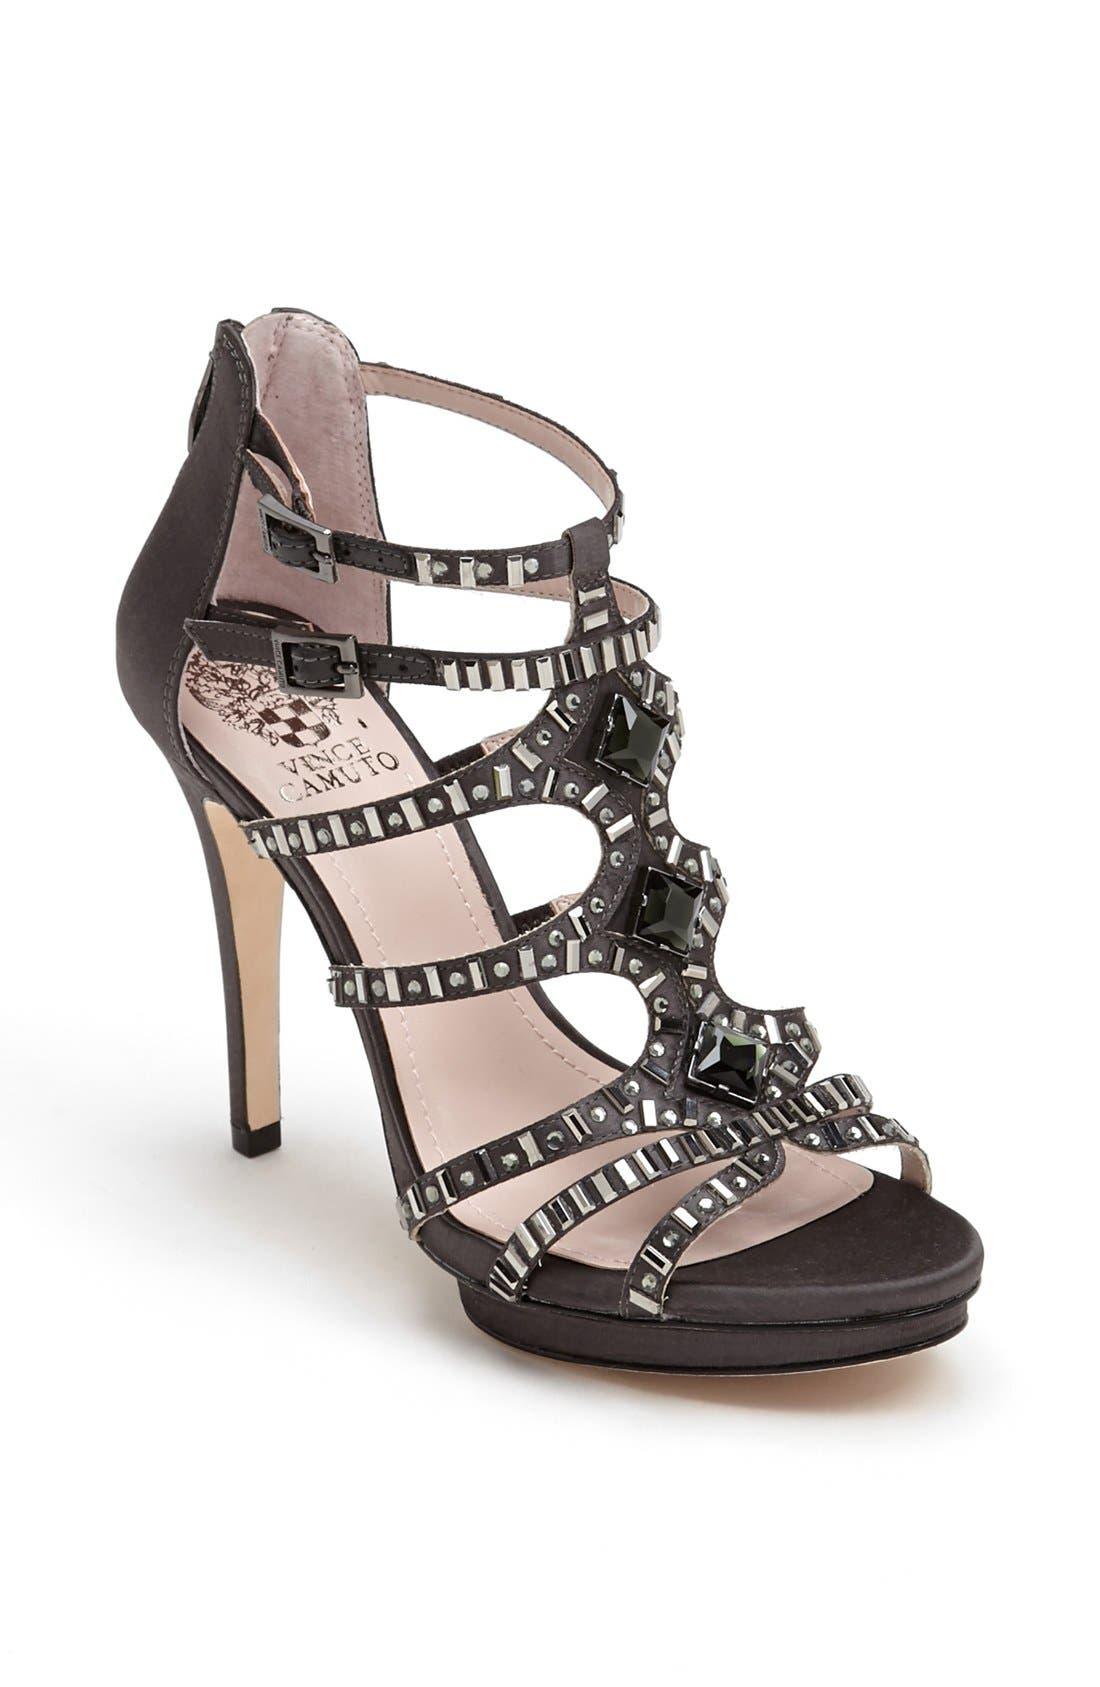 Main Image - Vince Camuto 'Crista' Sandal